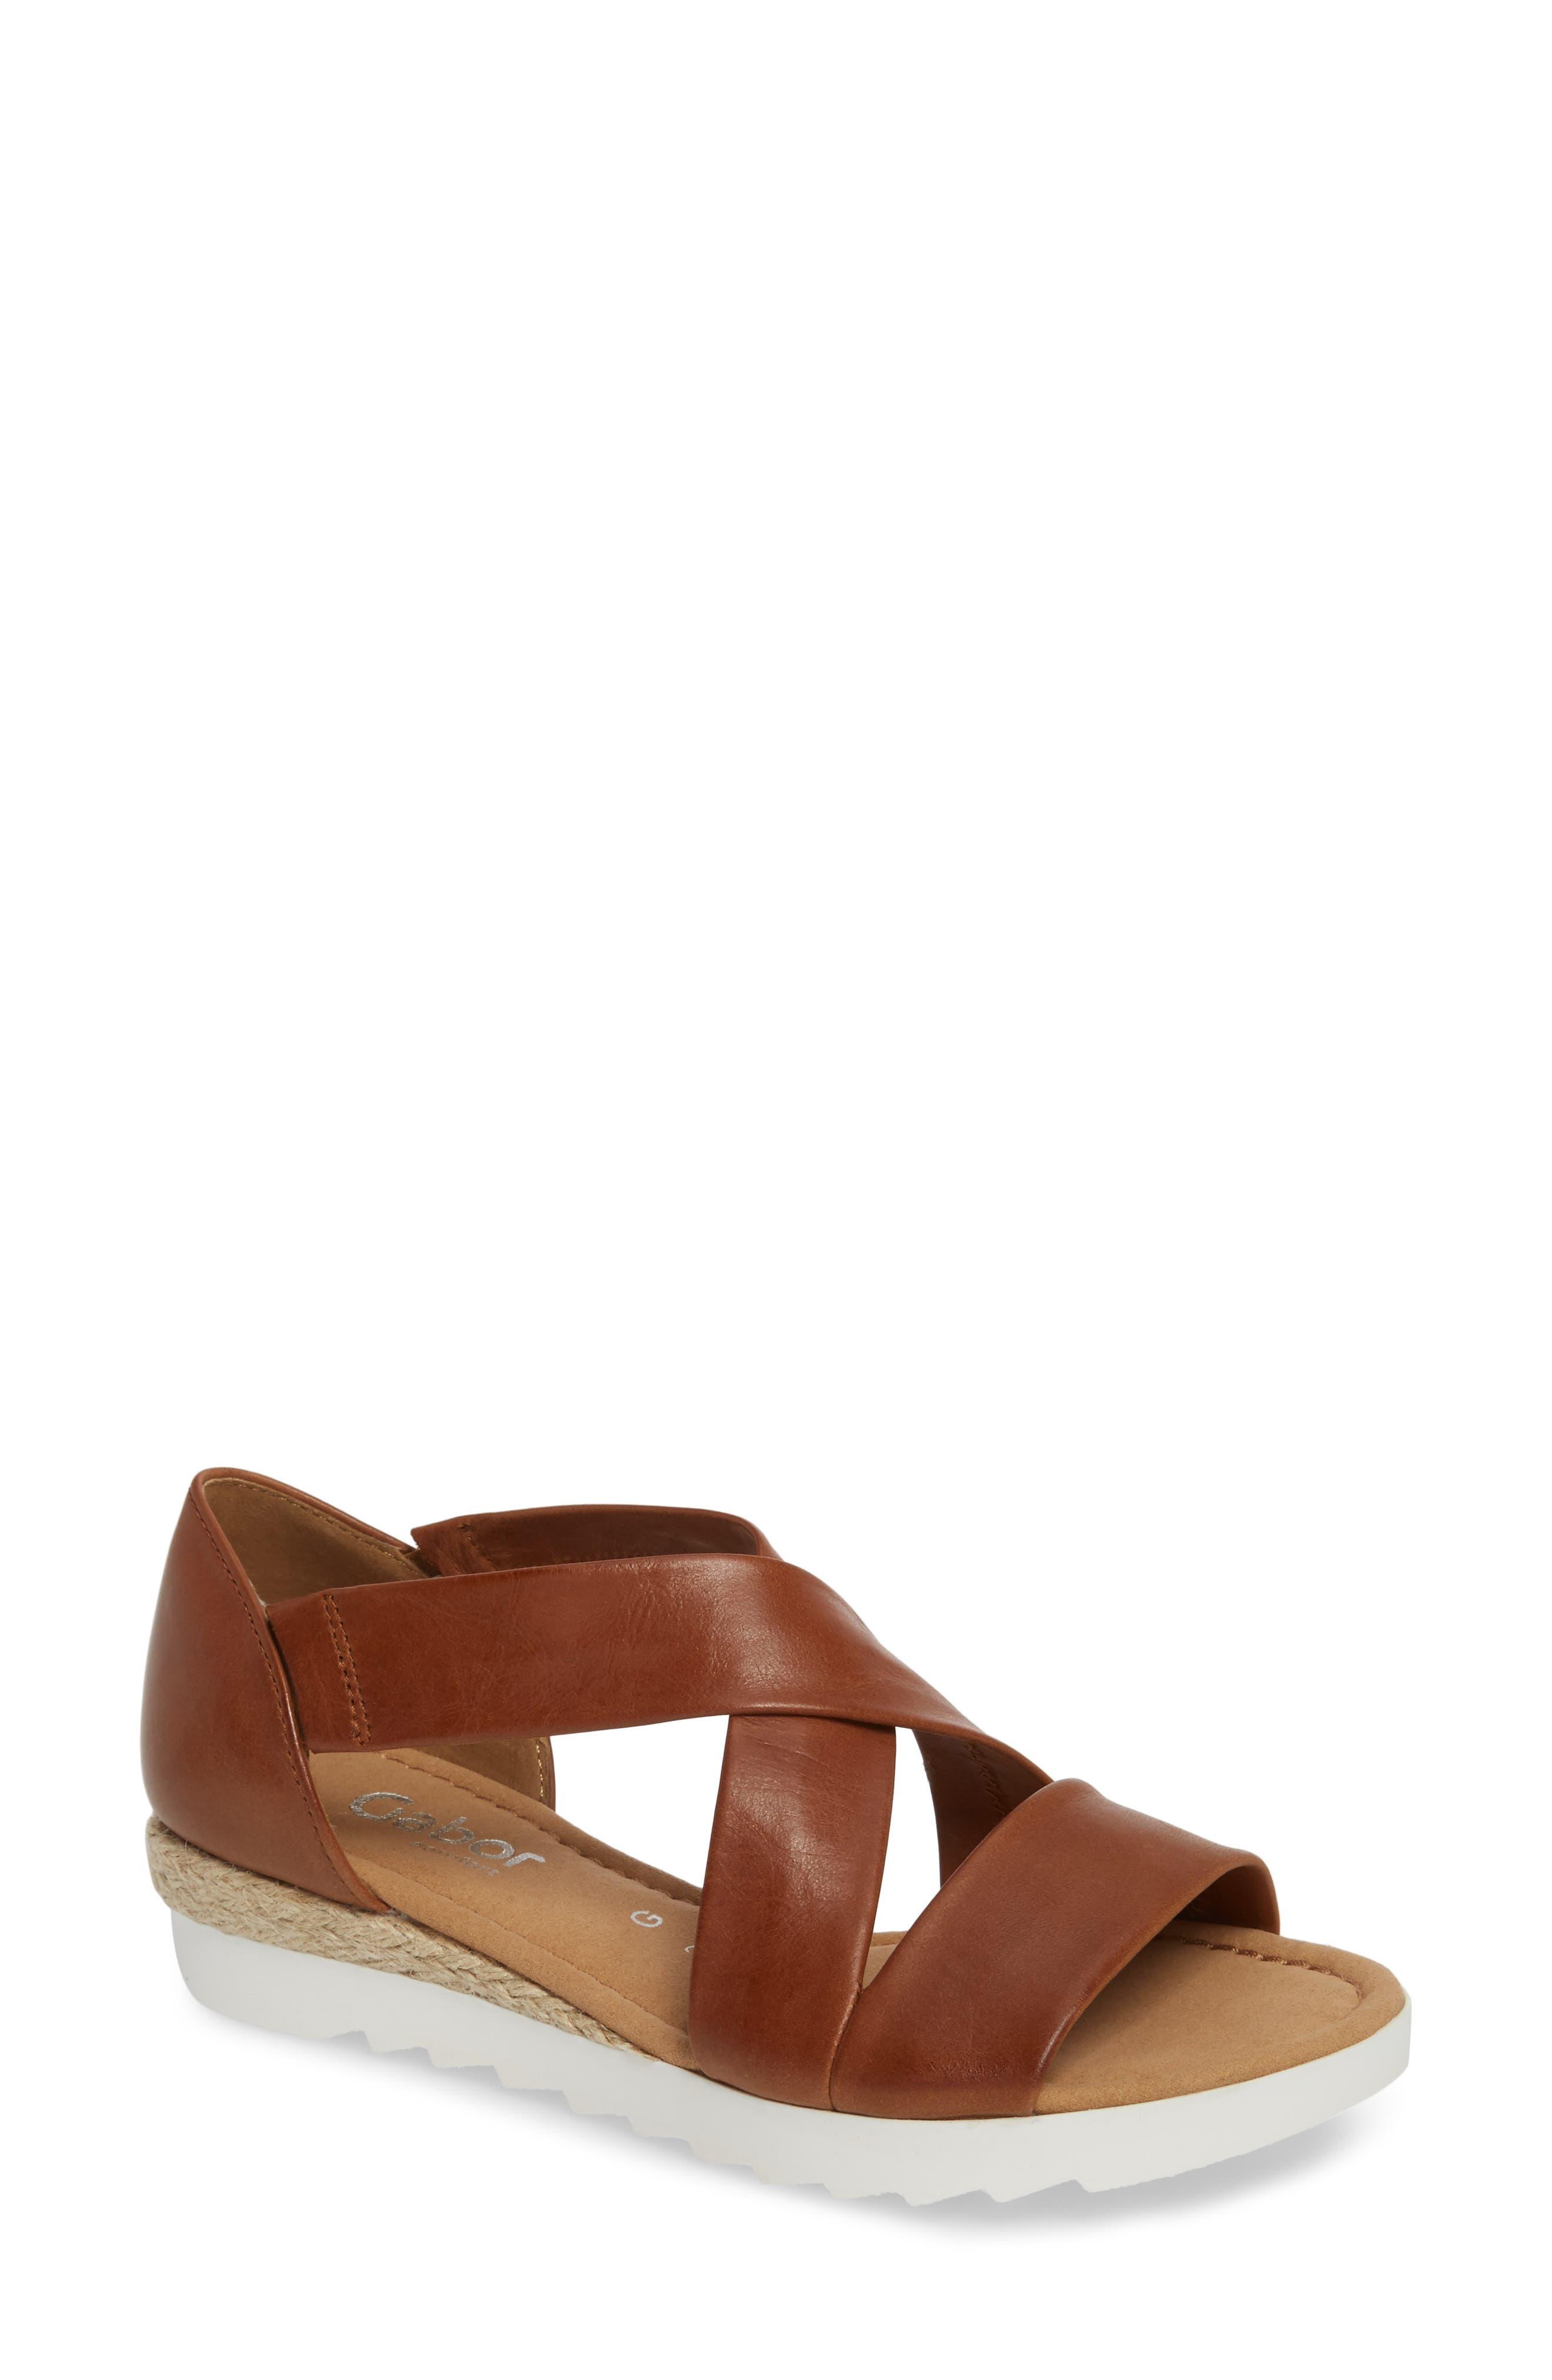 Cross Strap Sandal,                             Main thumbnail 1, color,                             Brown Leather